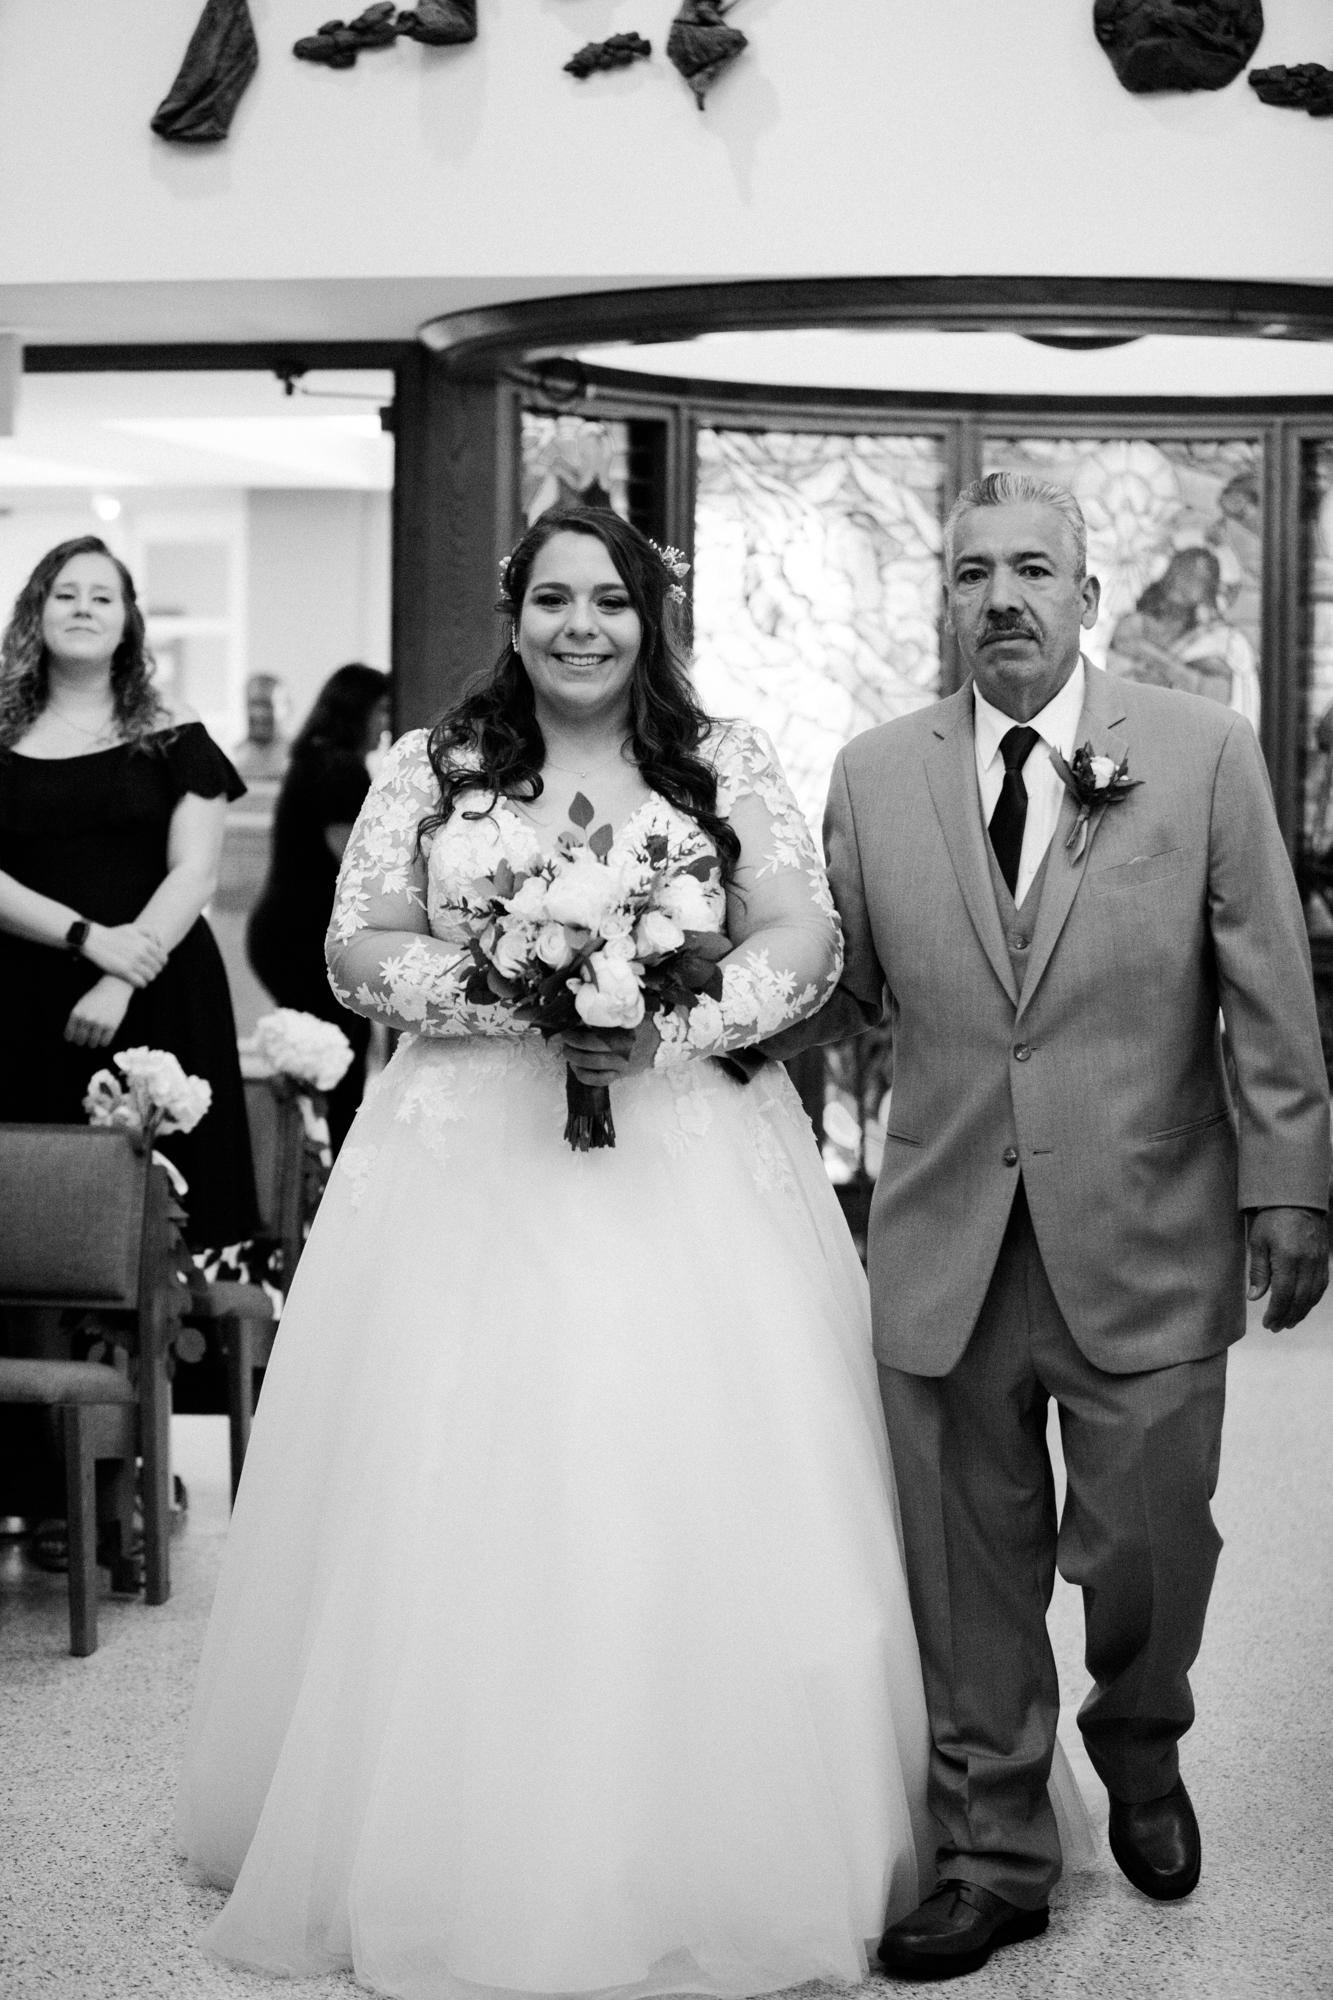 arlington-heights-wedding-jessica-matthew-2809